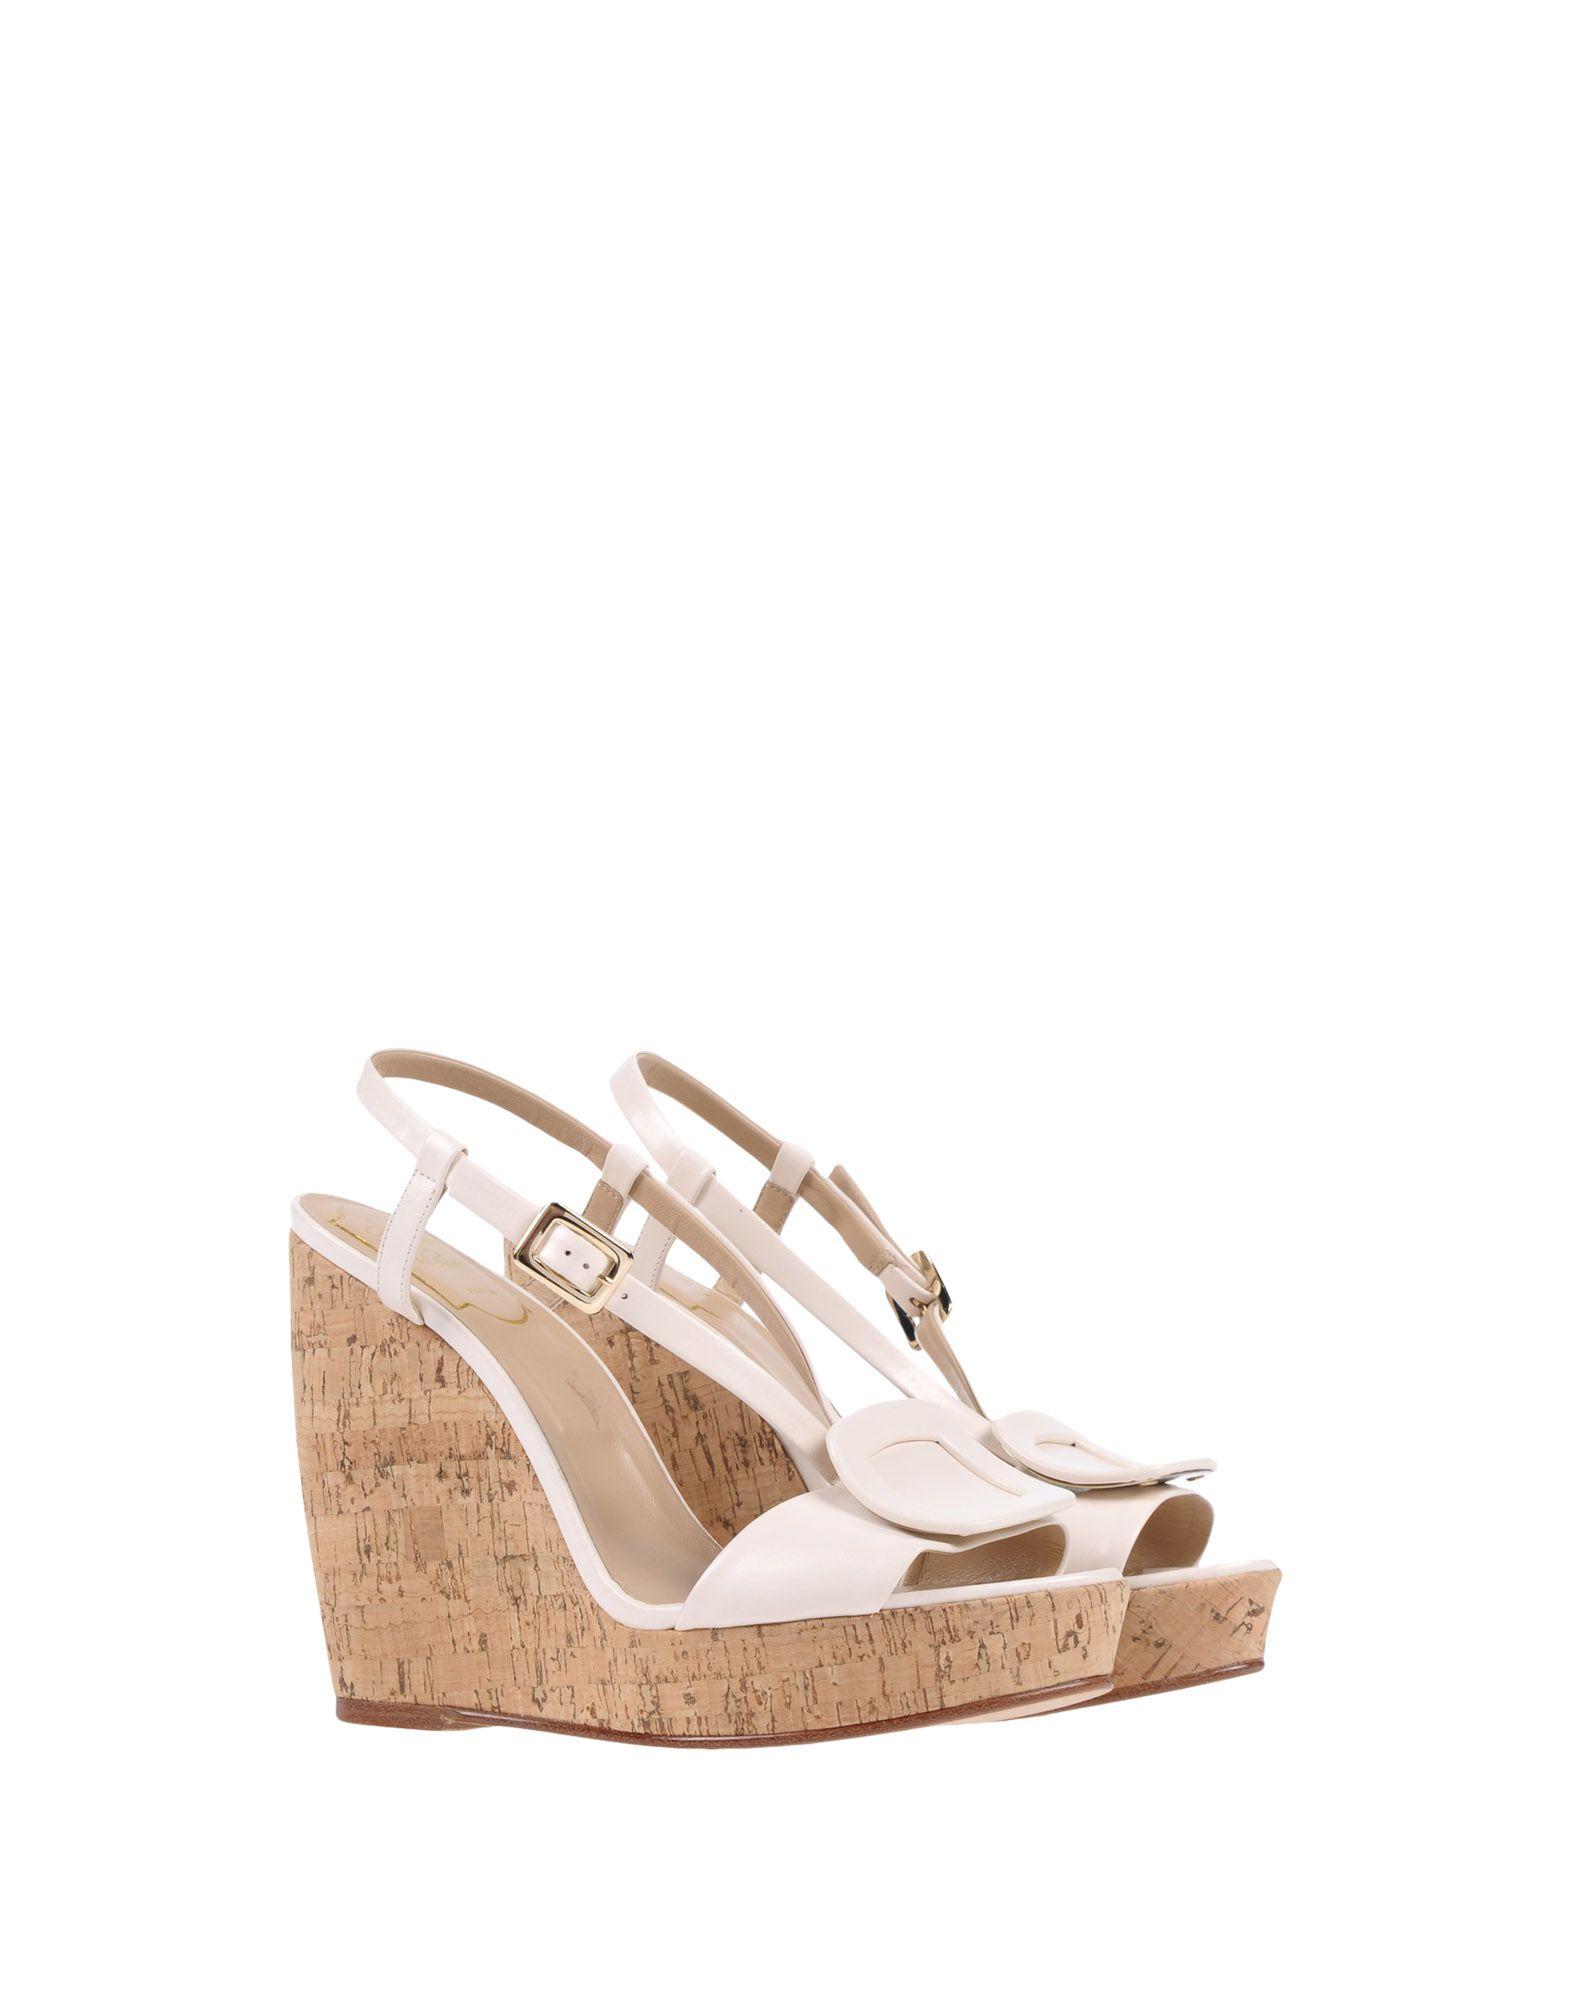 roger vivier des sandales - femmes roger vivier des sandales - en ligne le royaume - sandales uni - 11501025ob c6ab73